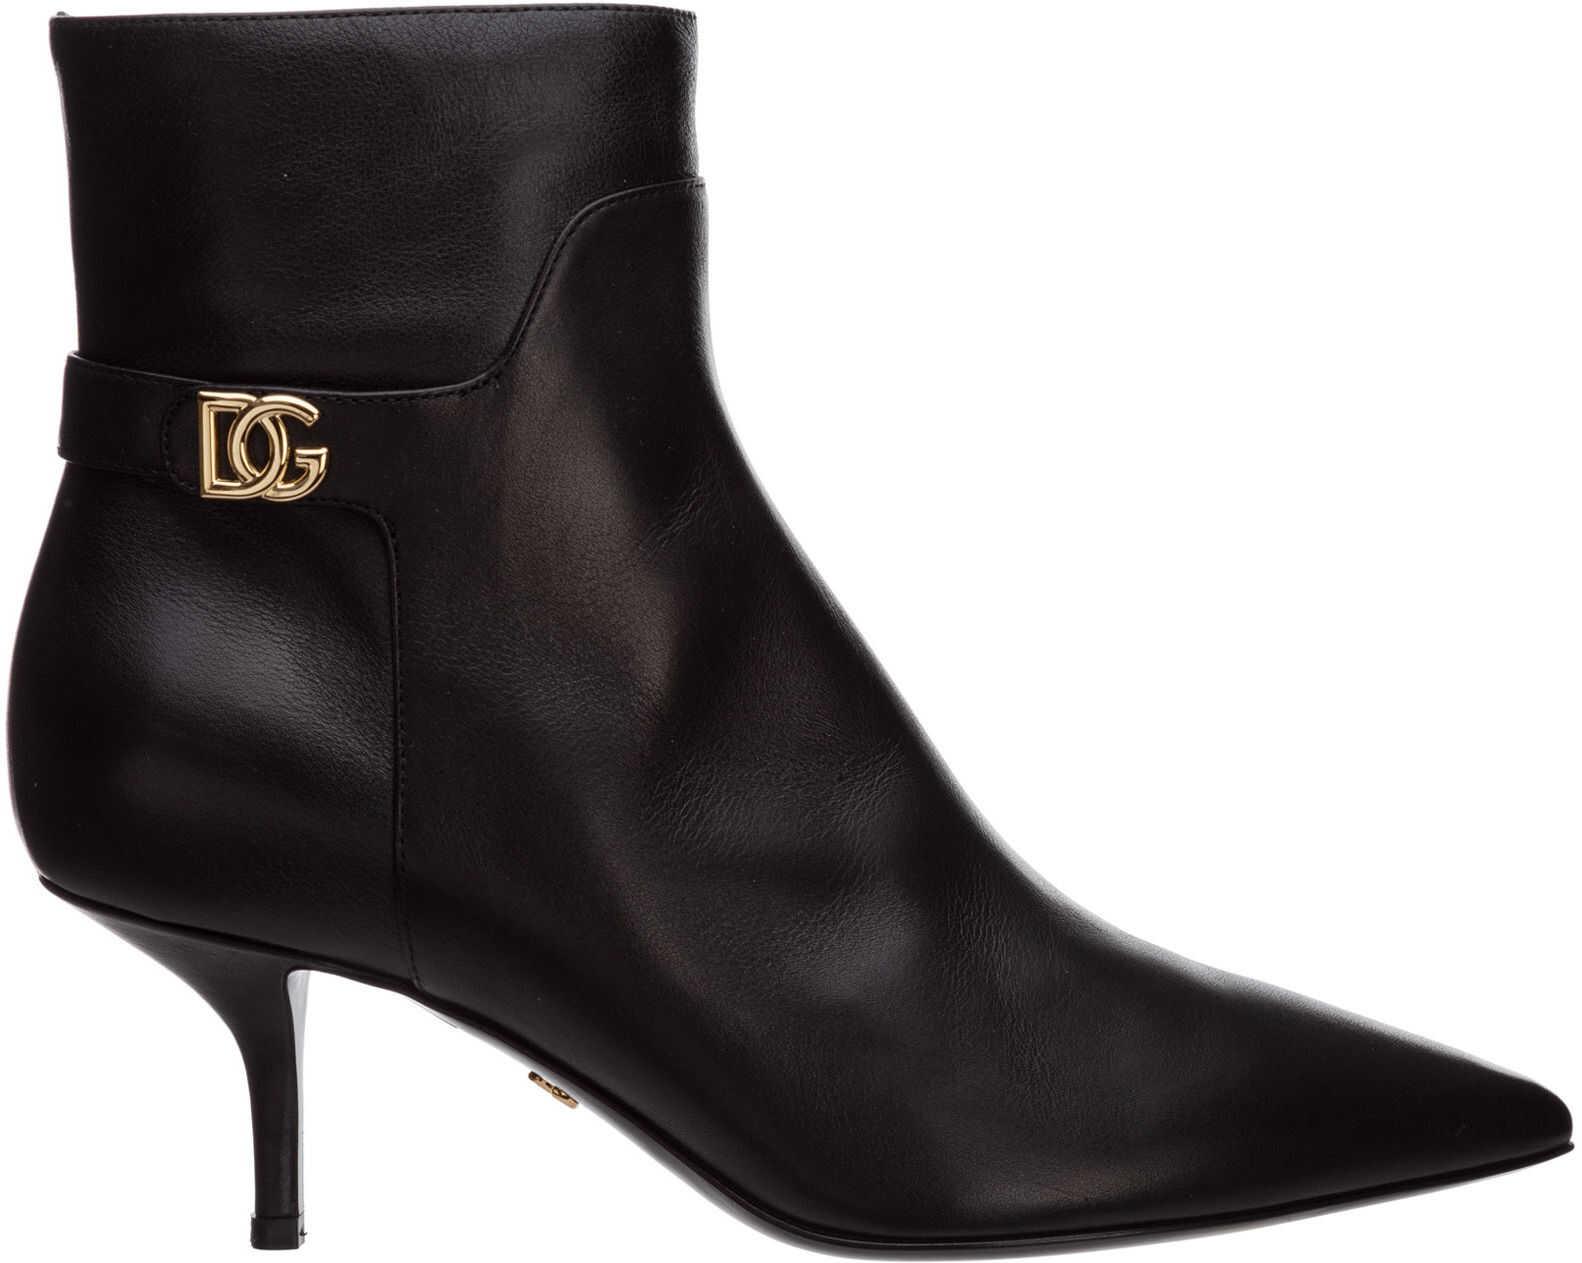 Dolce & Gabbana Boots Booties CT0700AW69580999 Black imagine b-mall.ro